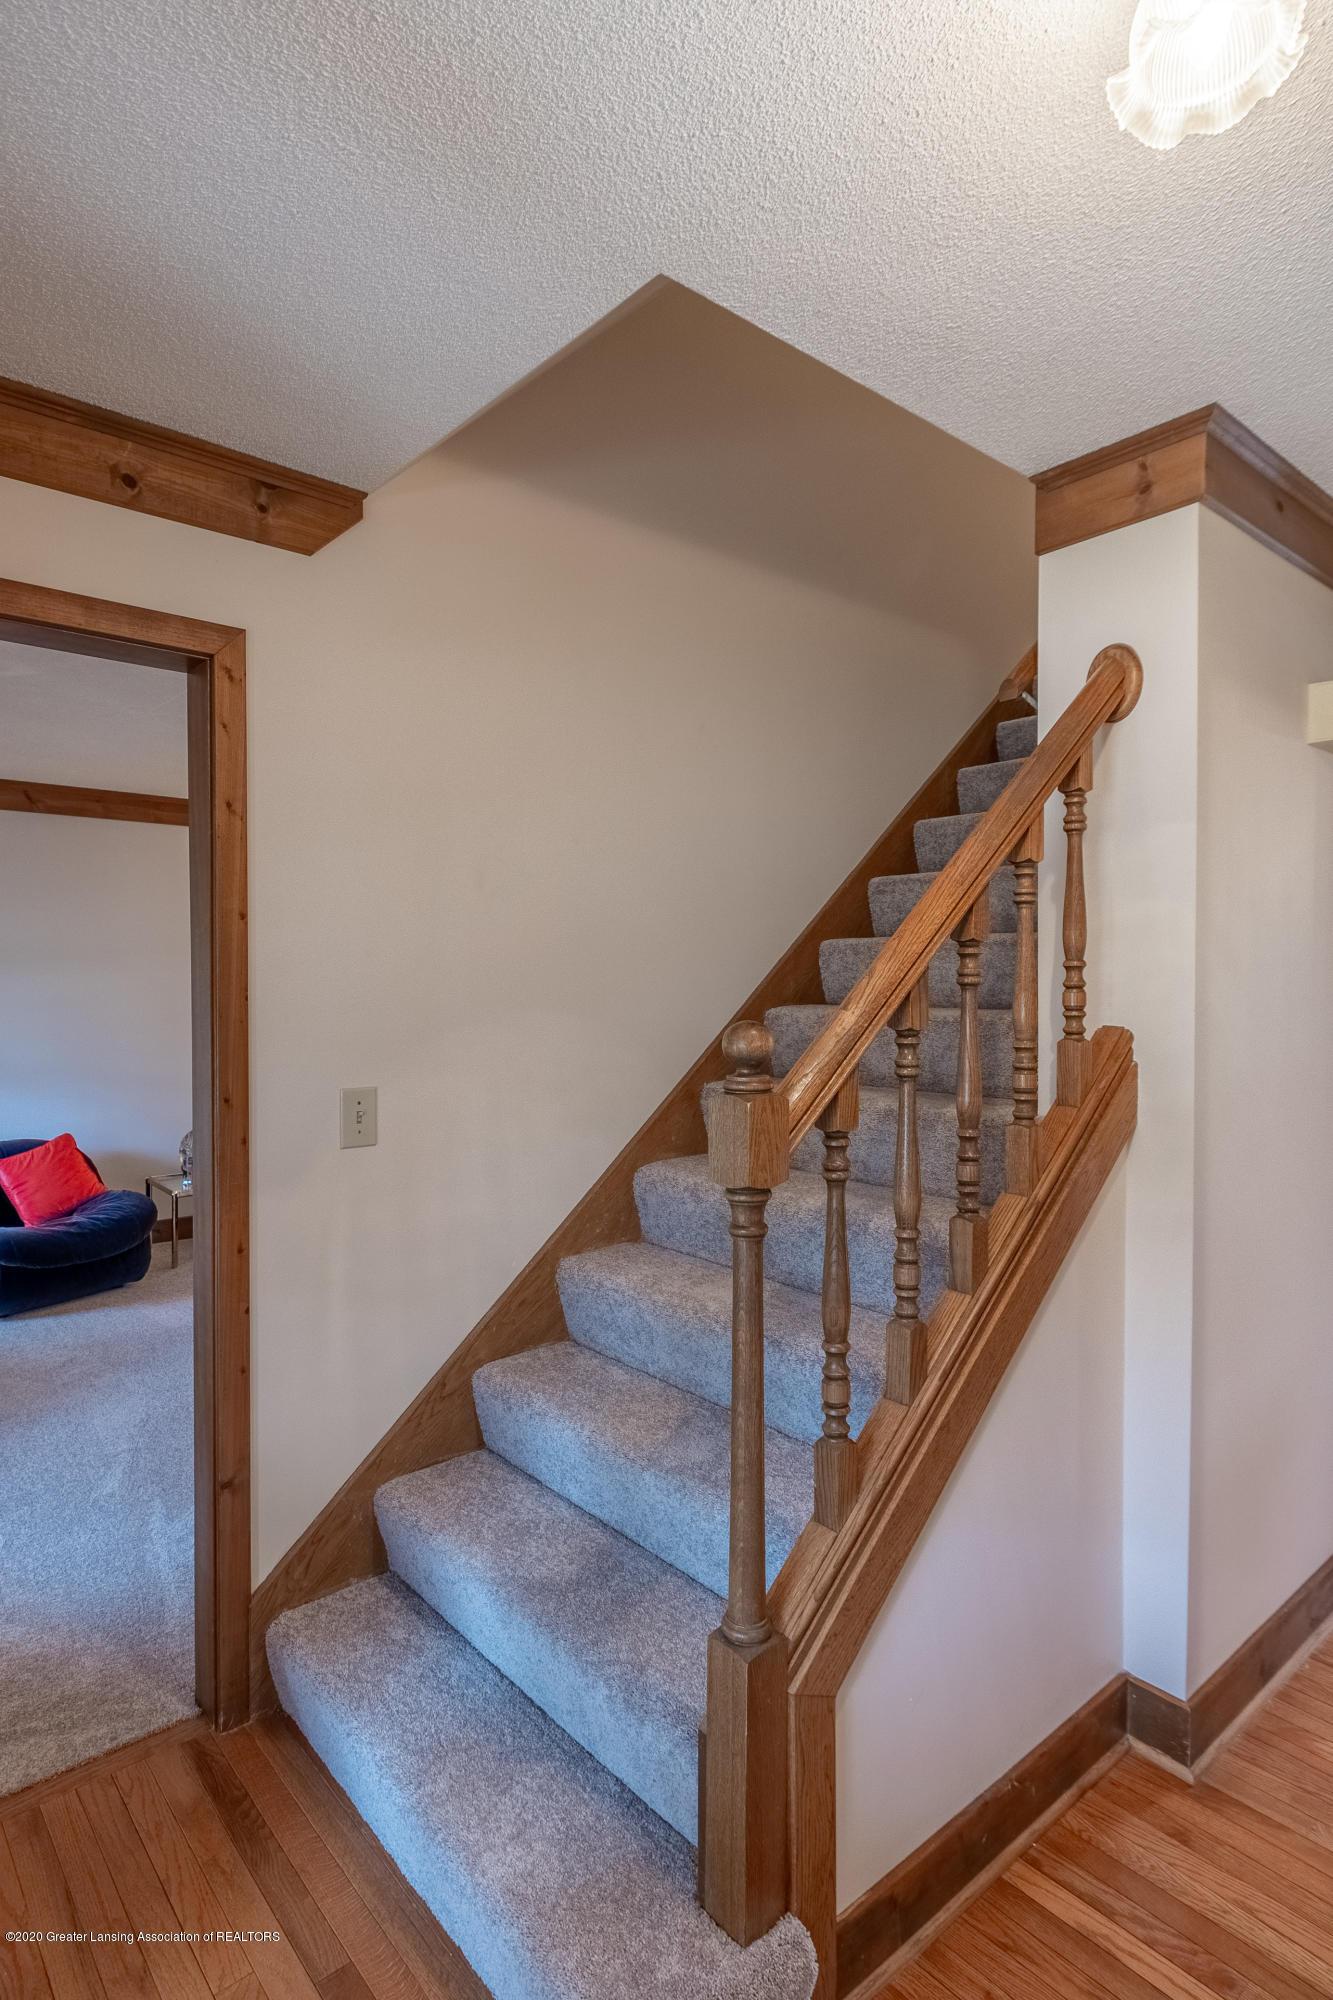 3945 Breckinridge Dr - Stairs to Upper Level - 8